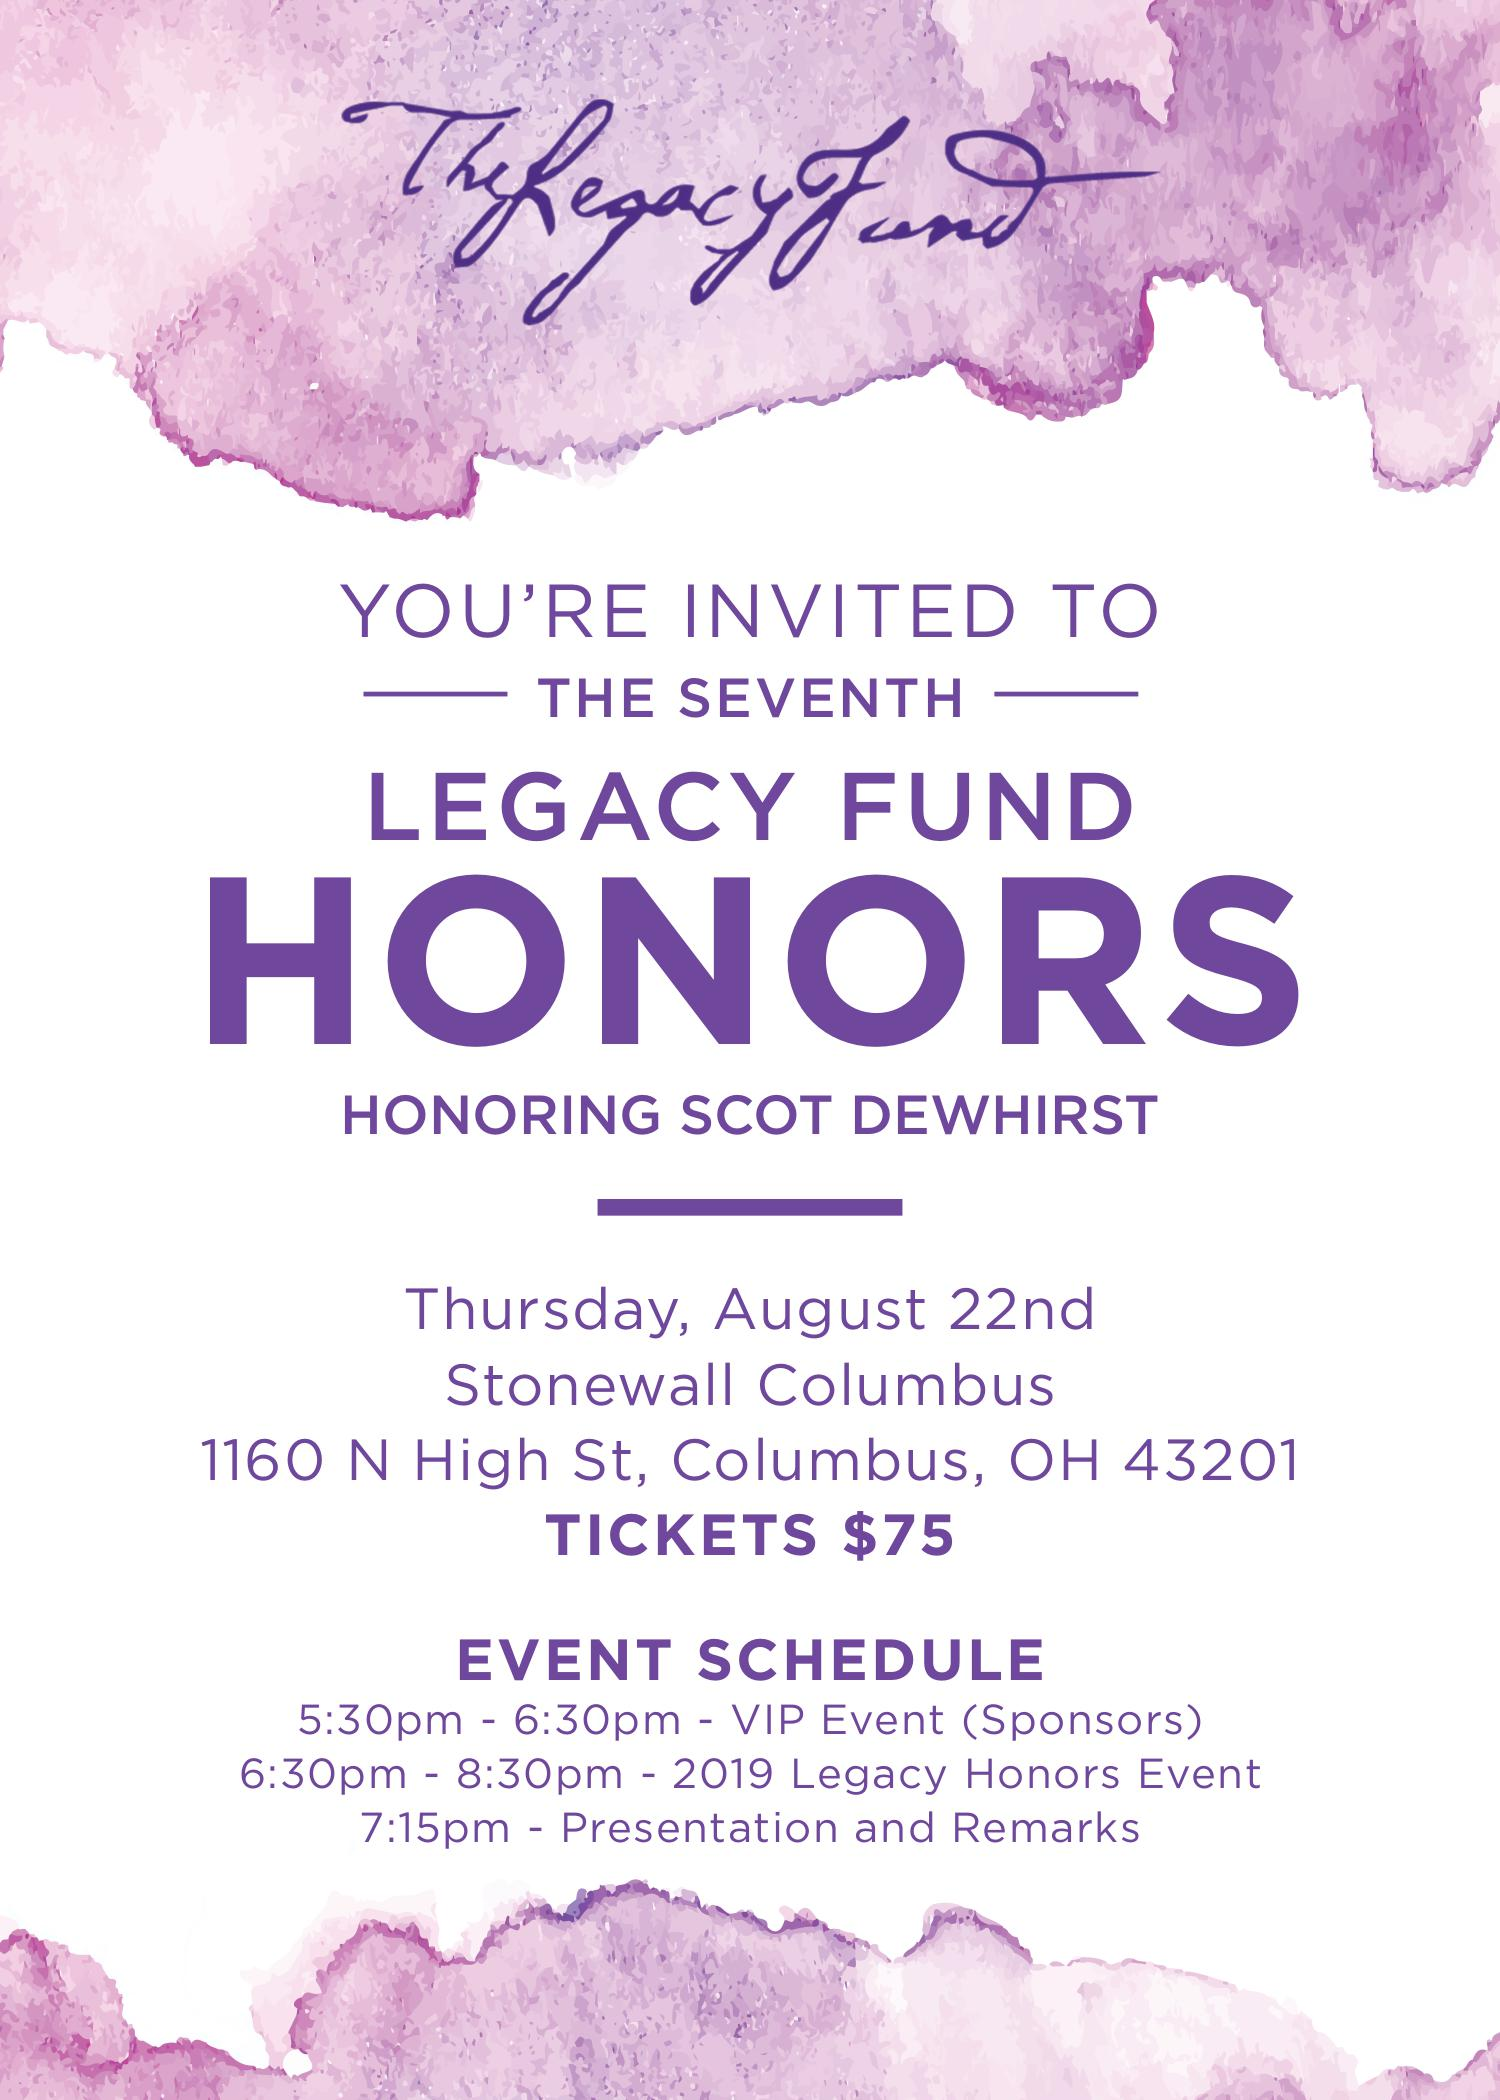 LegacyFundHonors_Invitation_V2.jpeg